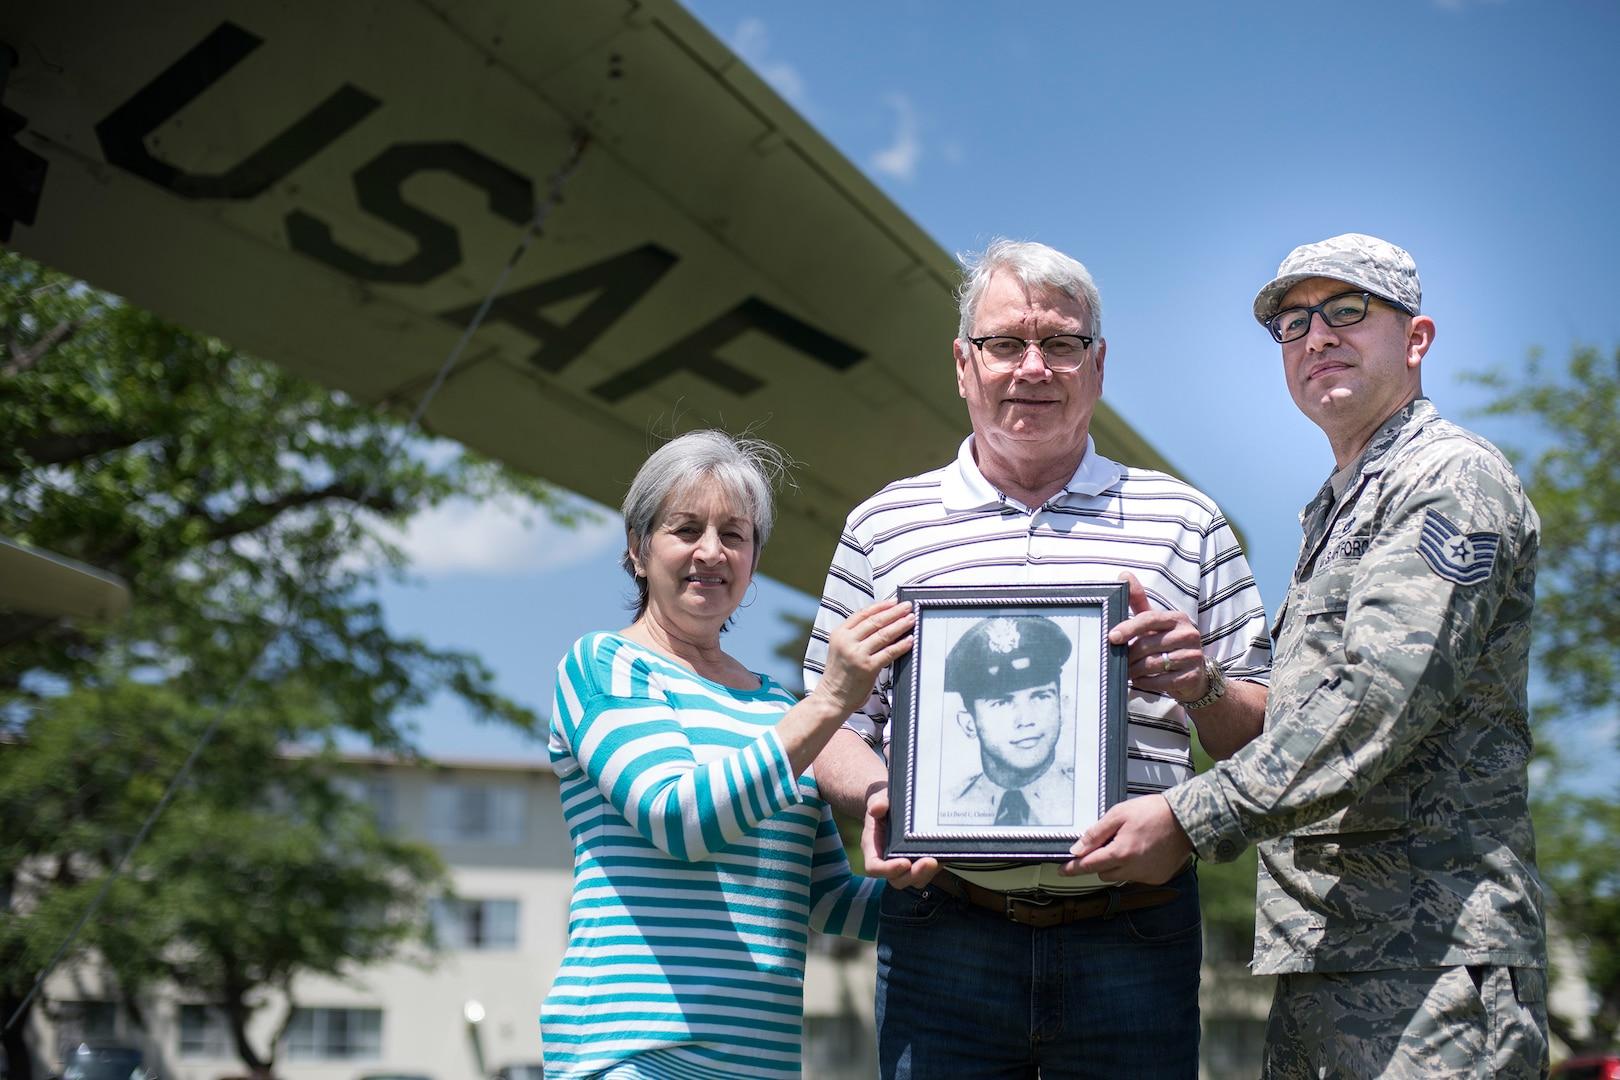 Korean War Pilot's Family Visits Memorial Aircraft at Misawa